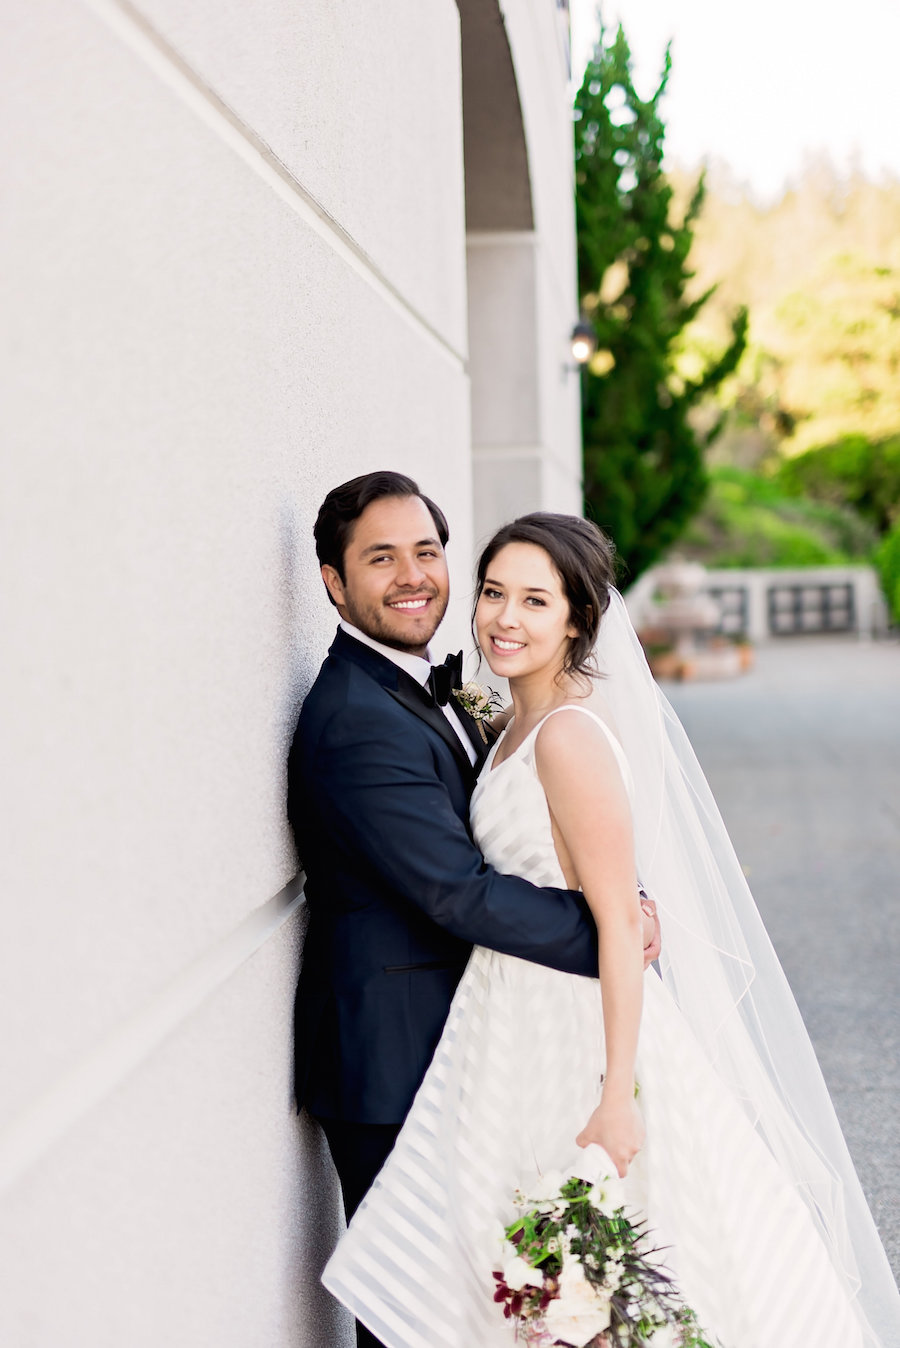 Rachel-Sergio-Wedding-Pharris-Photos-0100.jpg